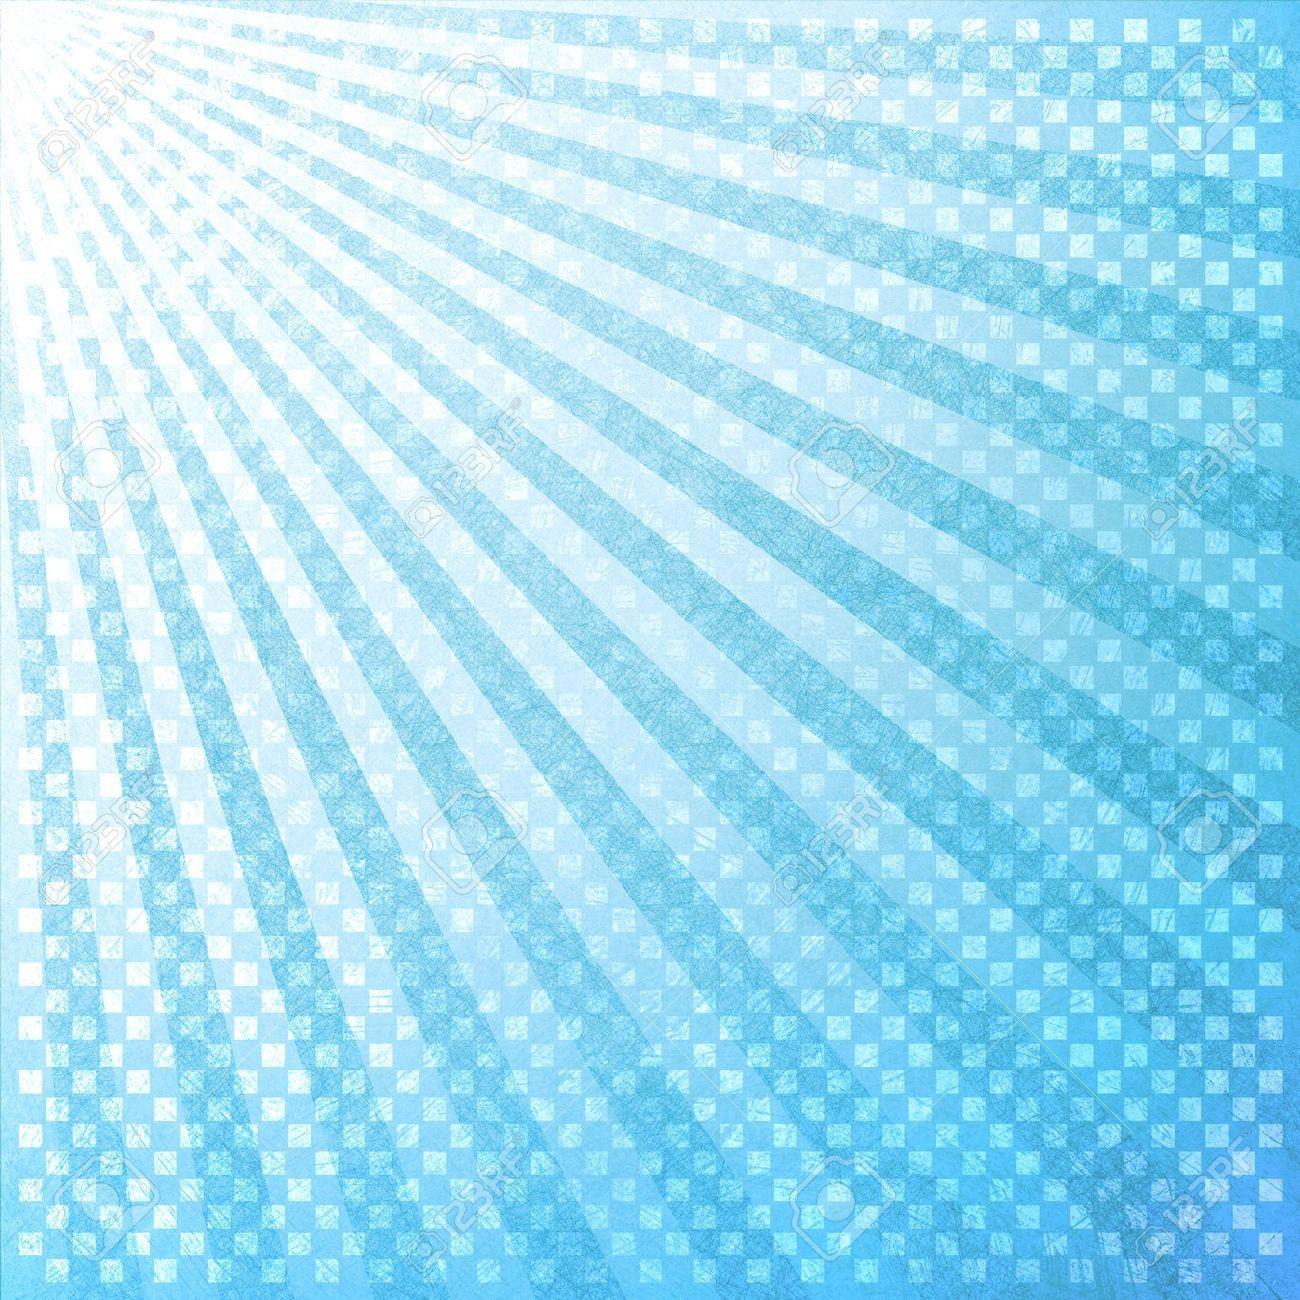 Background design sky blue hd download free background design background design sky blue hd download free background design sky blue download download background design voltagebd Choice Image